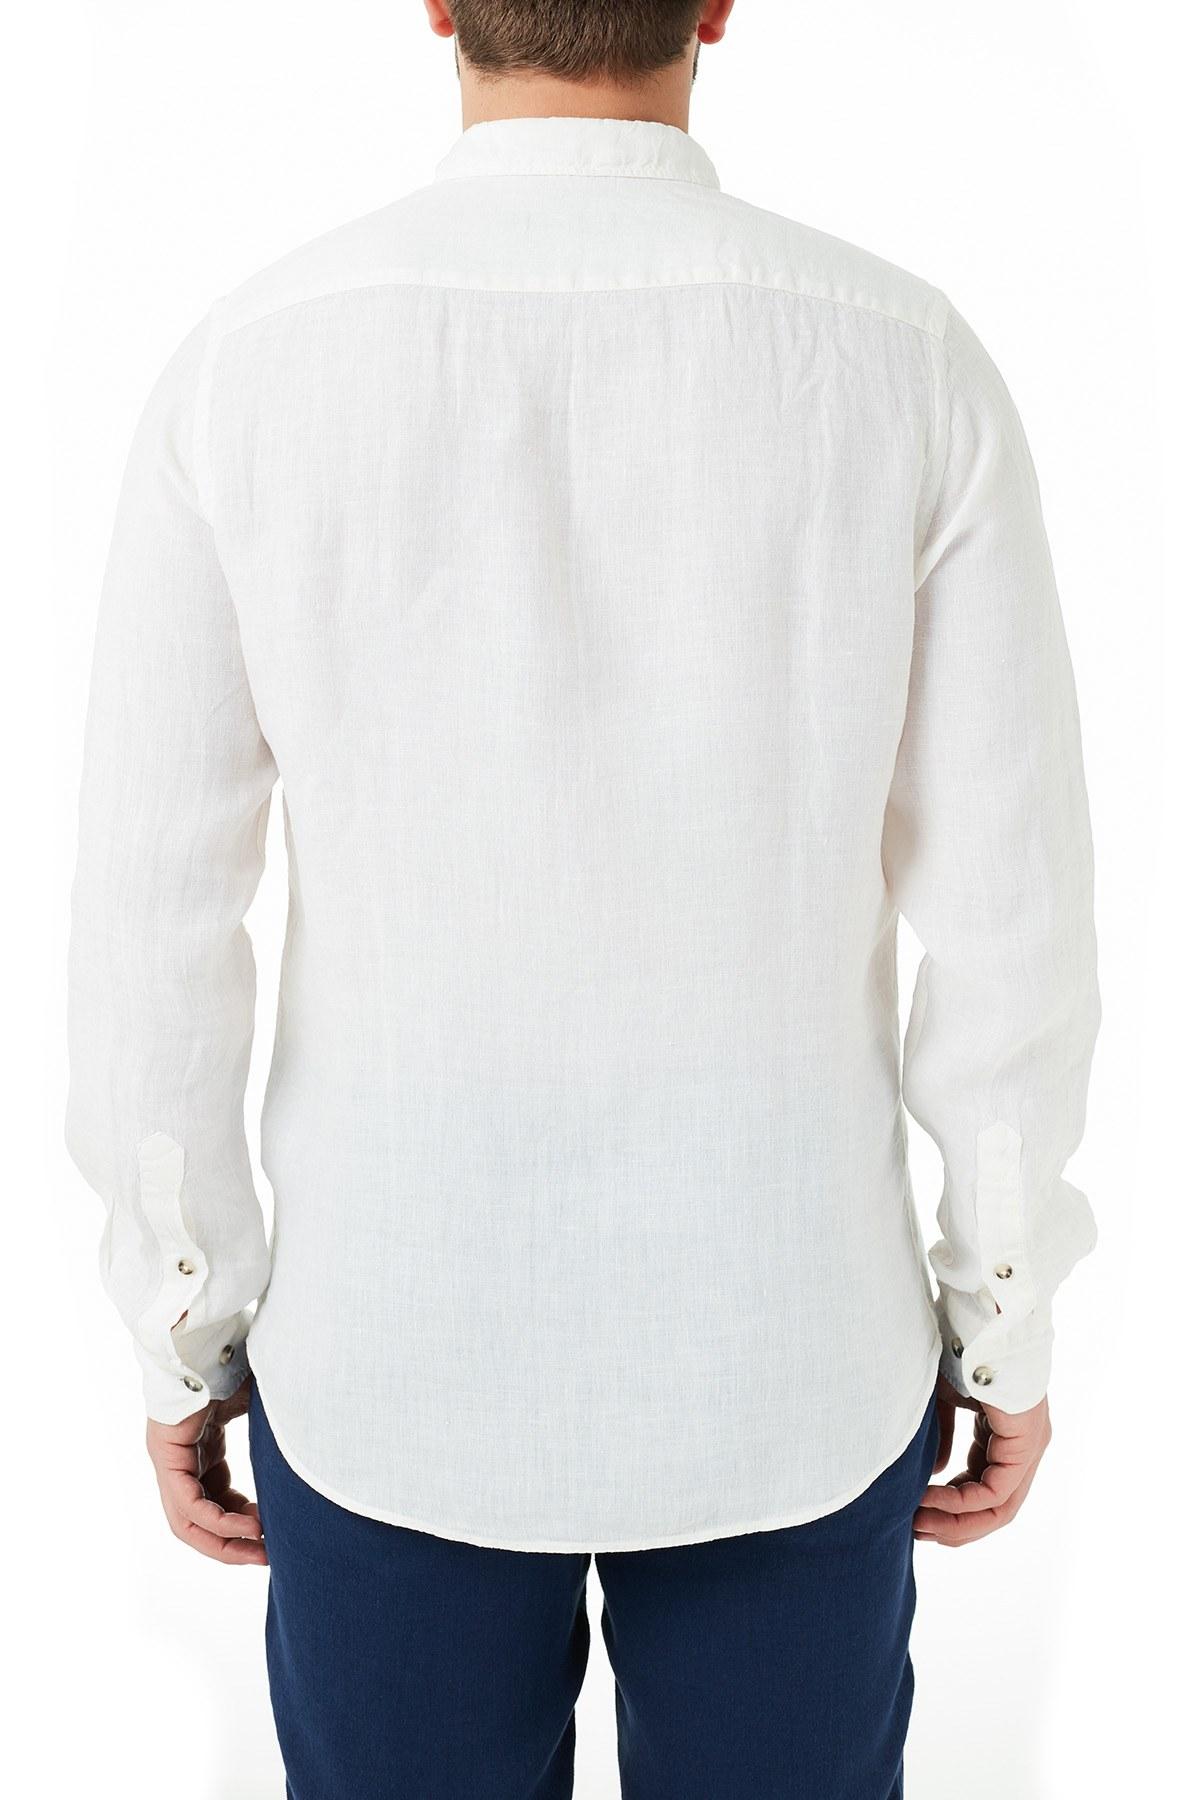 Ruck & Maul Düz Yaka Keten Erkek Gömlek S20M0220Y1201 BEYAZ